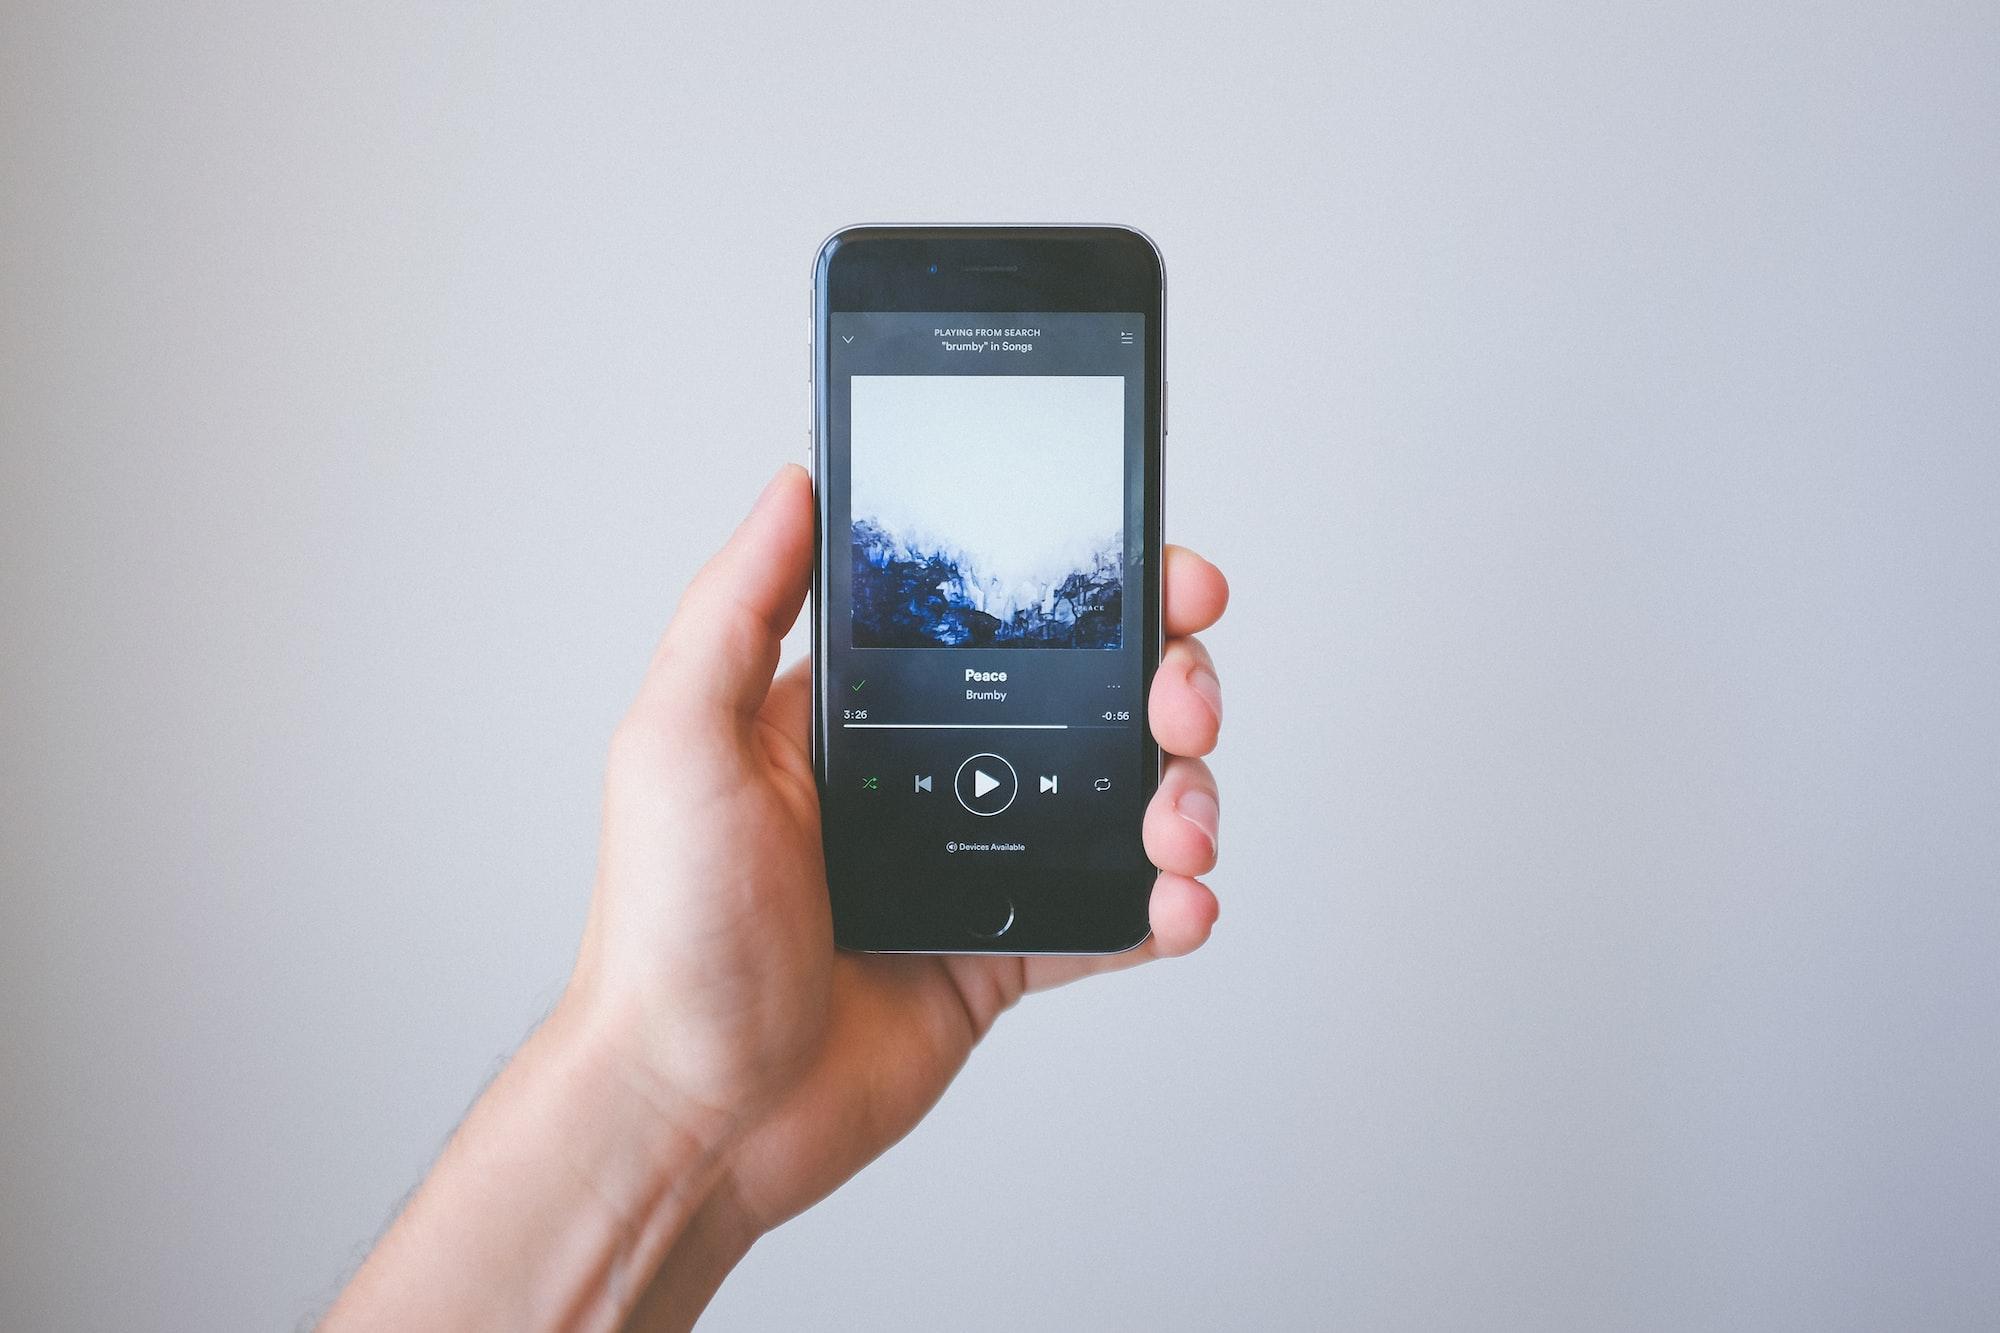 Spotify on smartphone